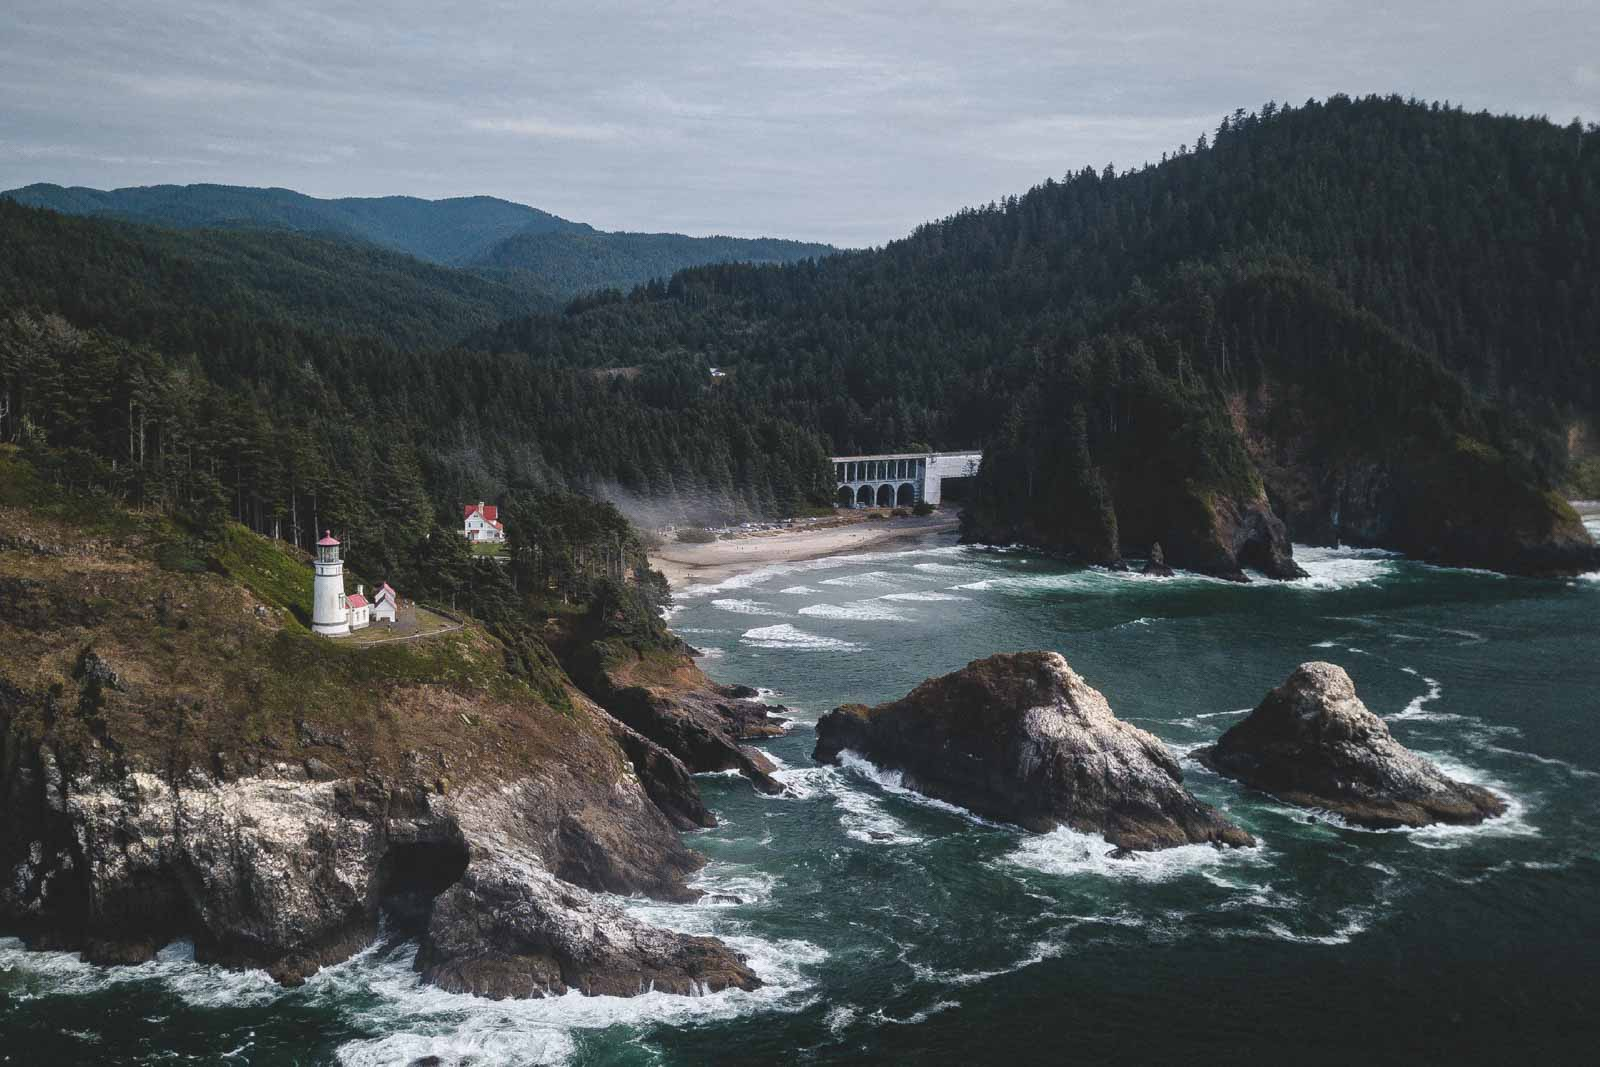 View of Oregon coast and Heceta Lighthouse, a popular Oregon Lighthouse